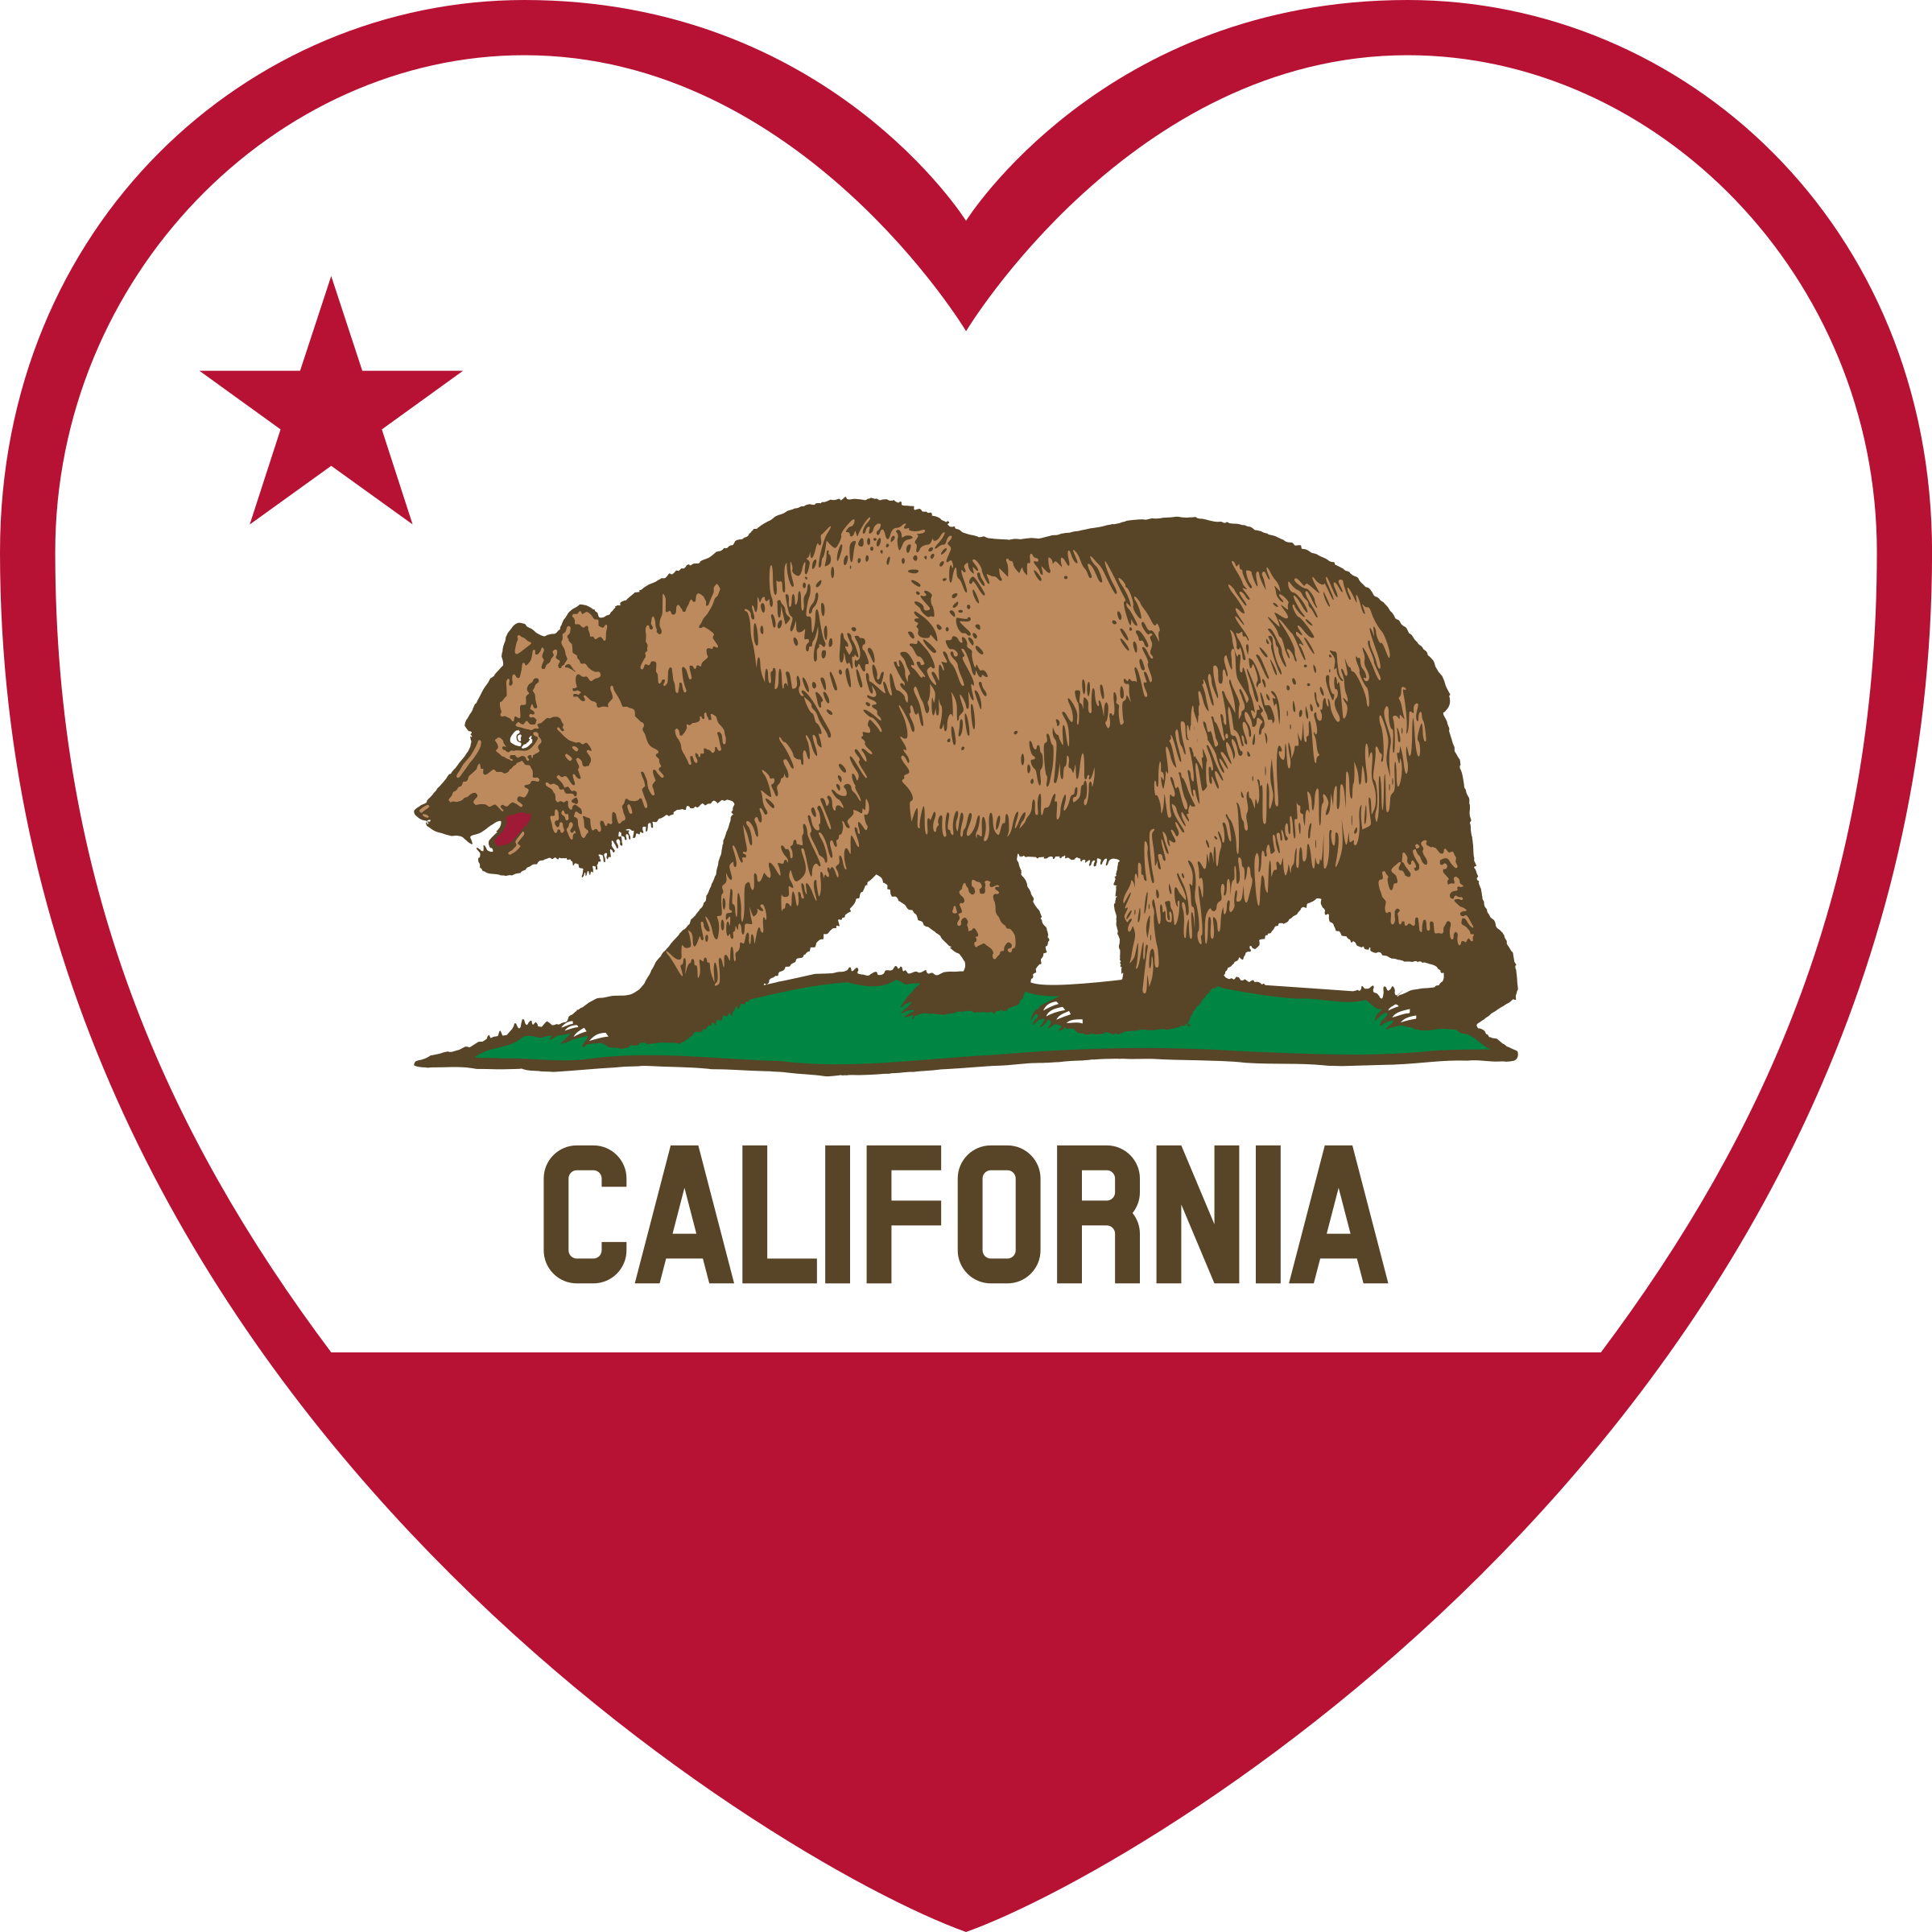 clip library library Flag heart big image. California clipart symbol california.